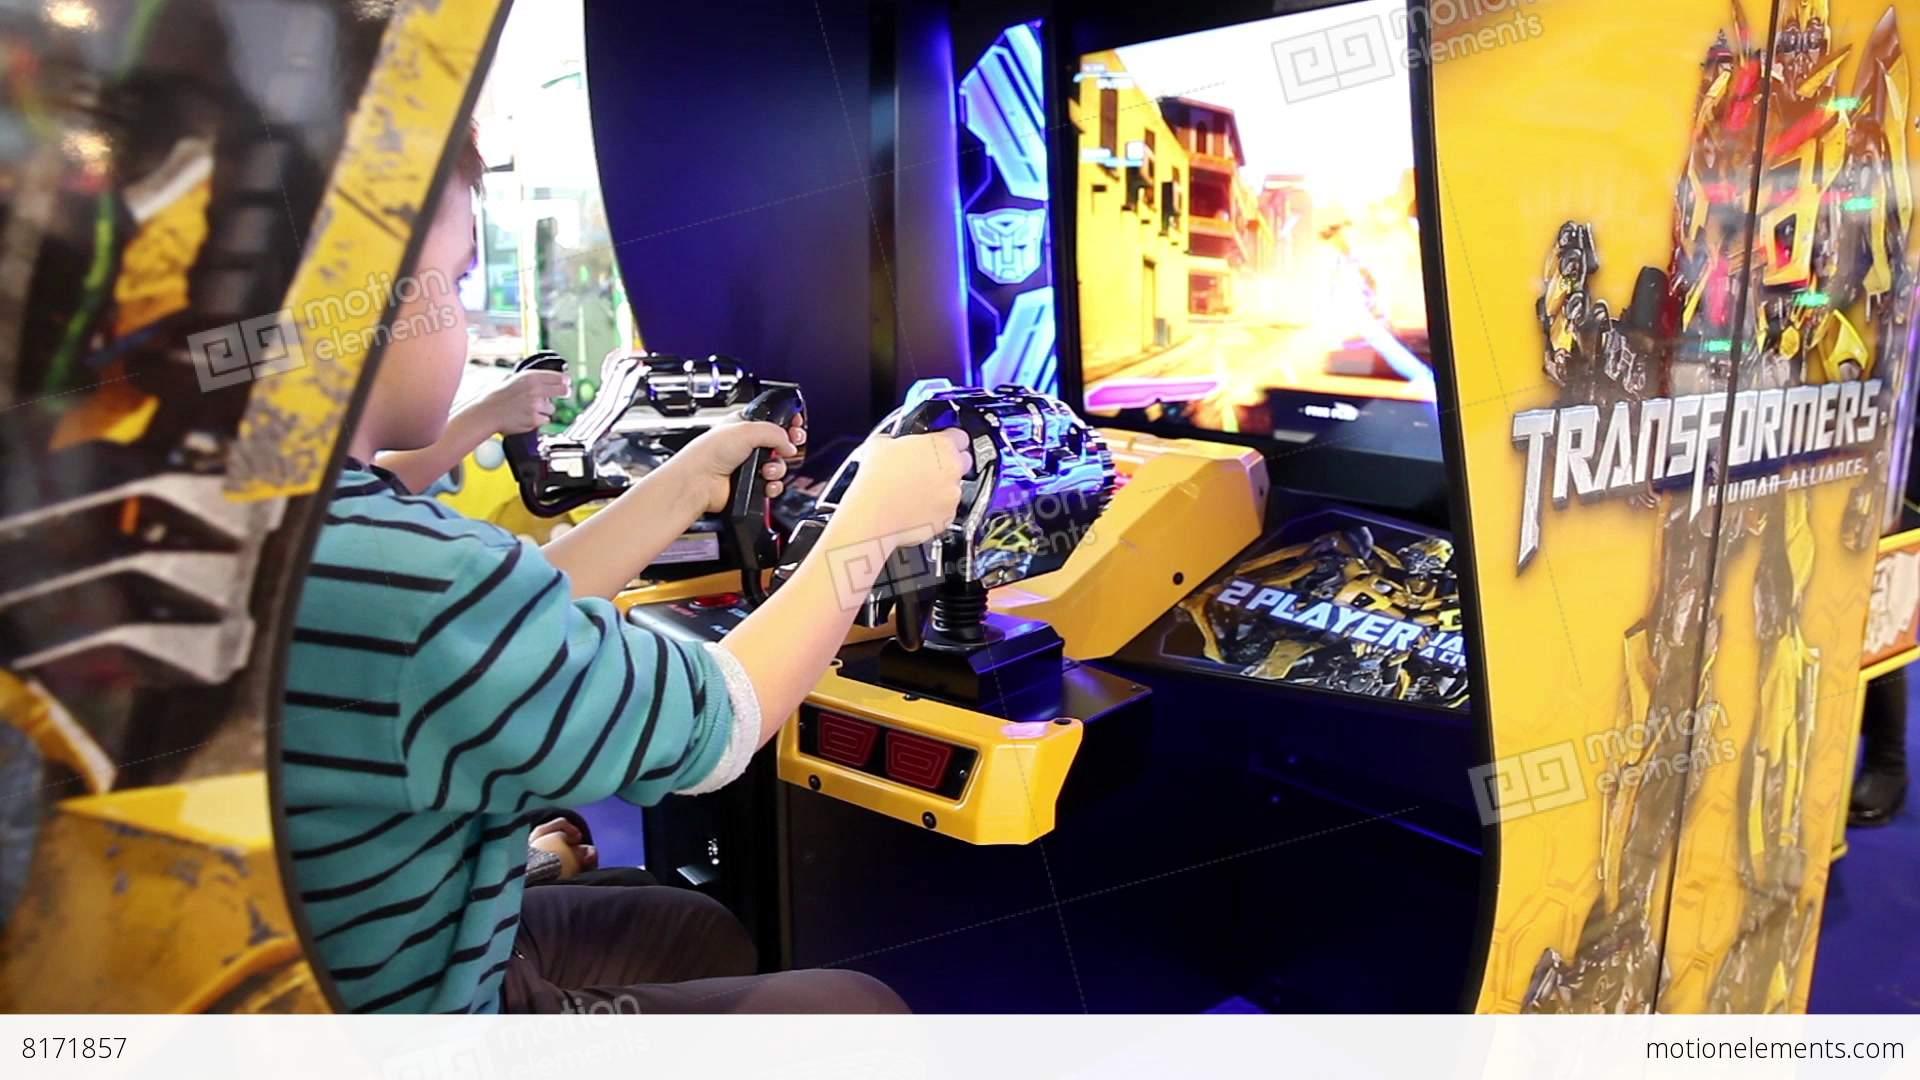 Transformers Human Alliance • Sega Arcade